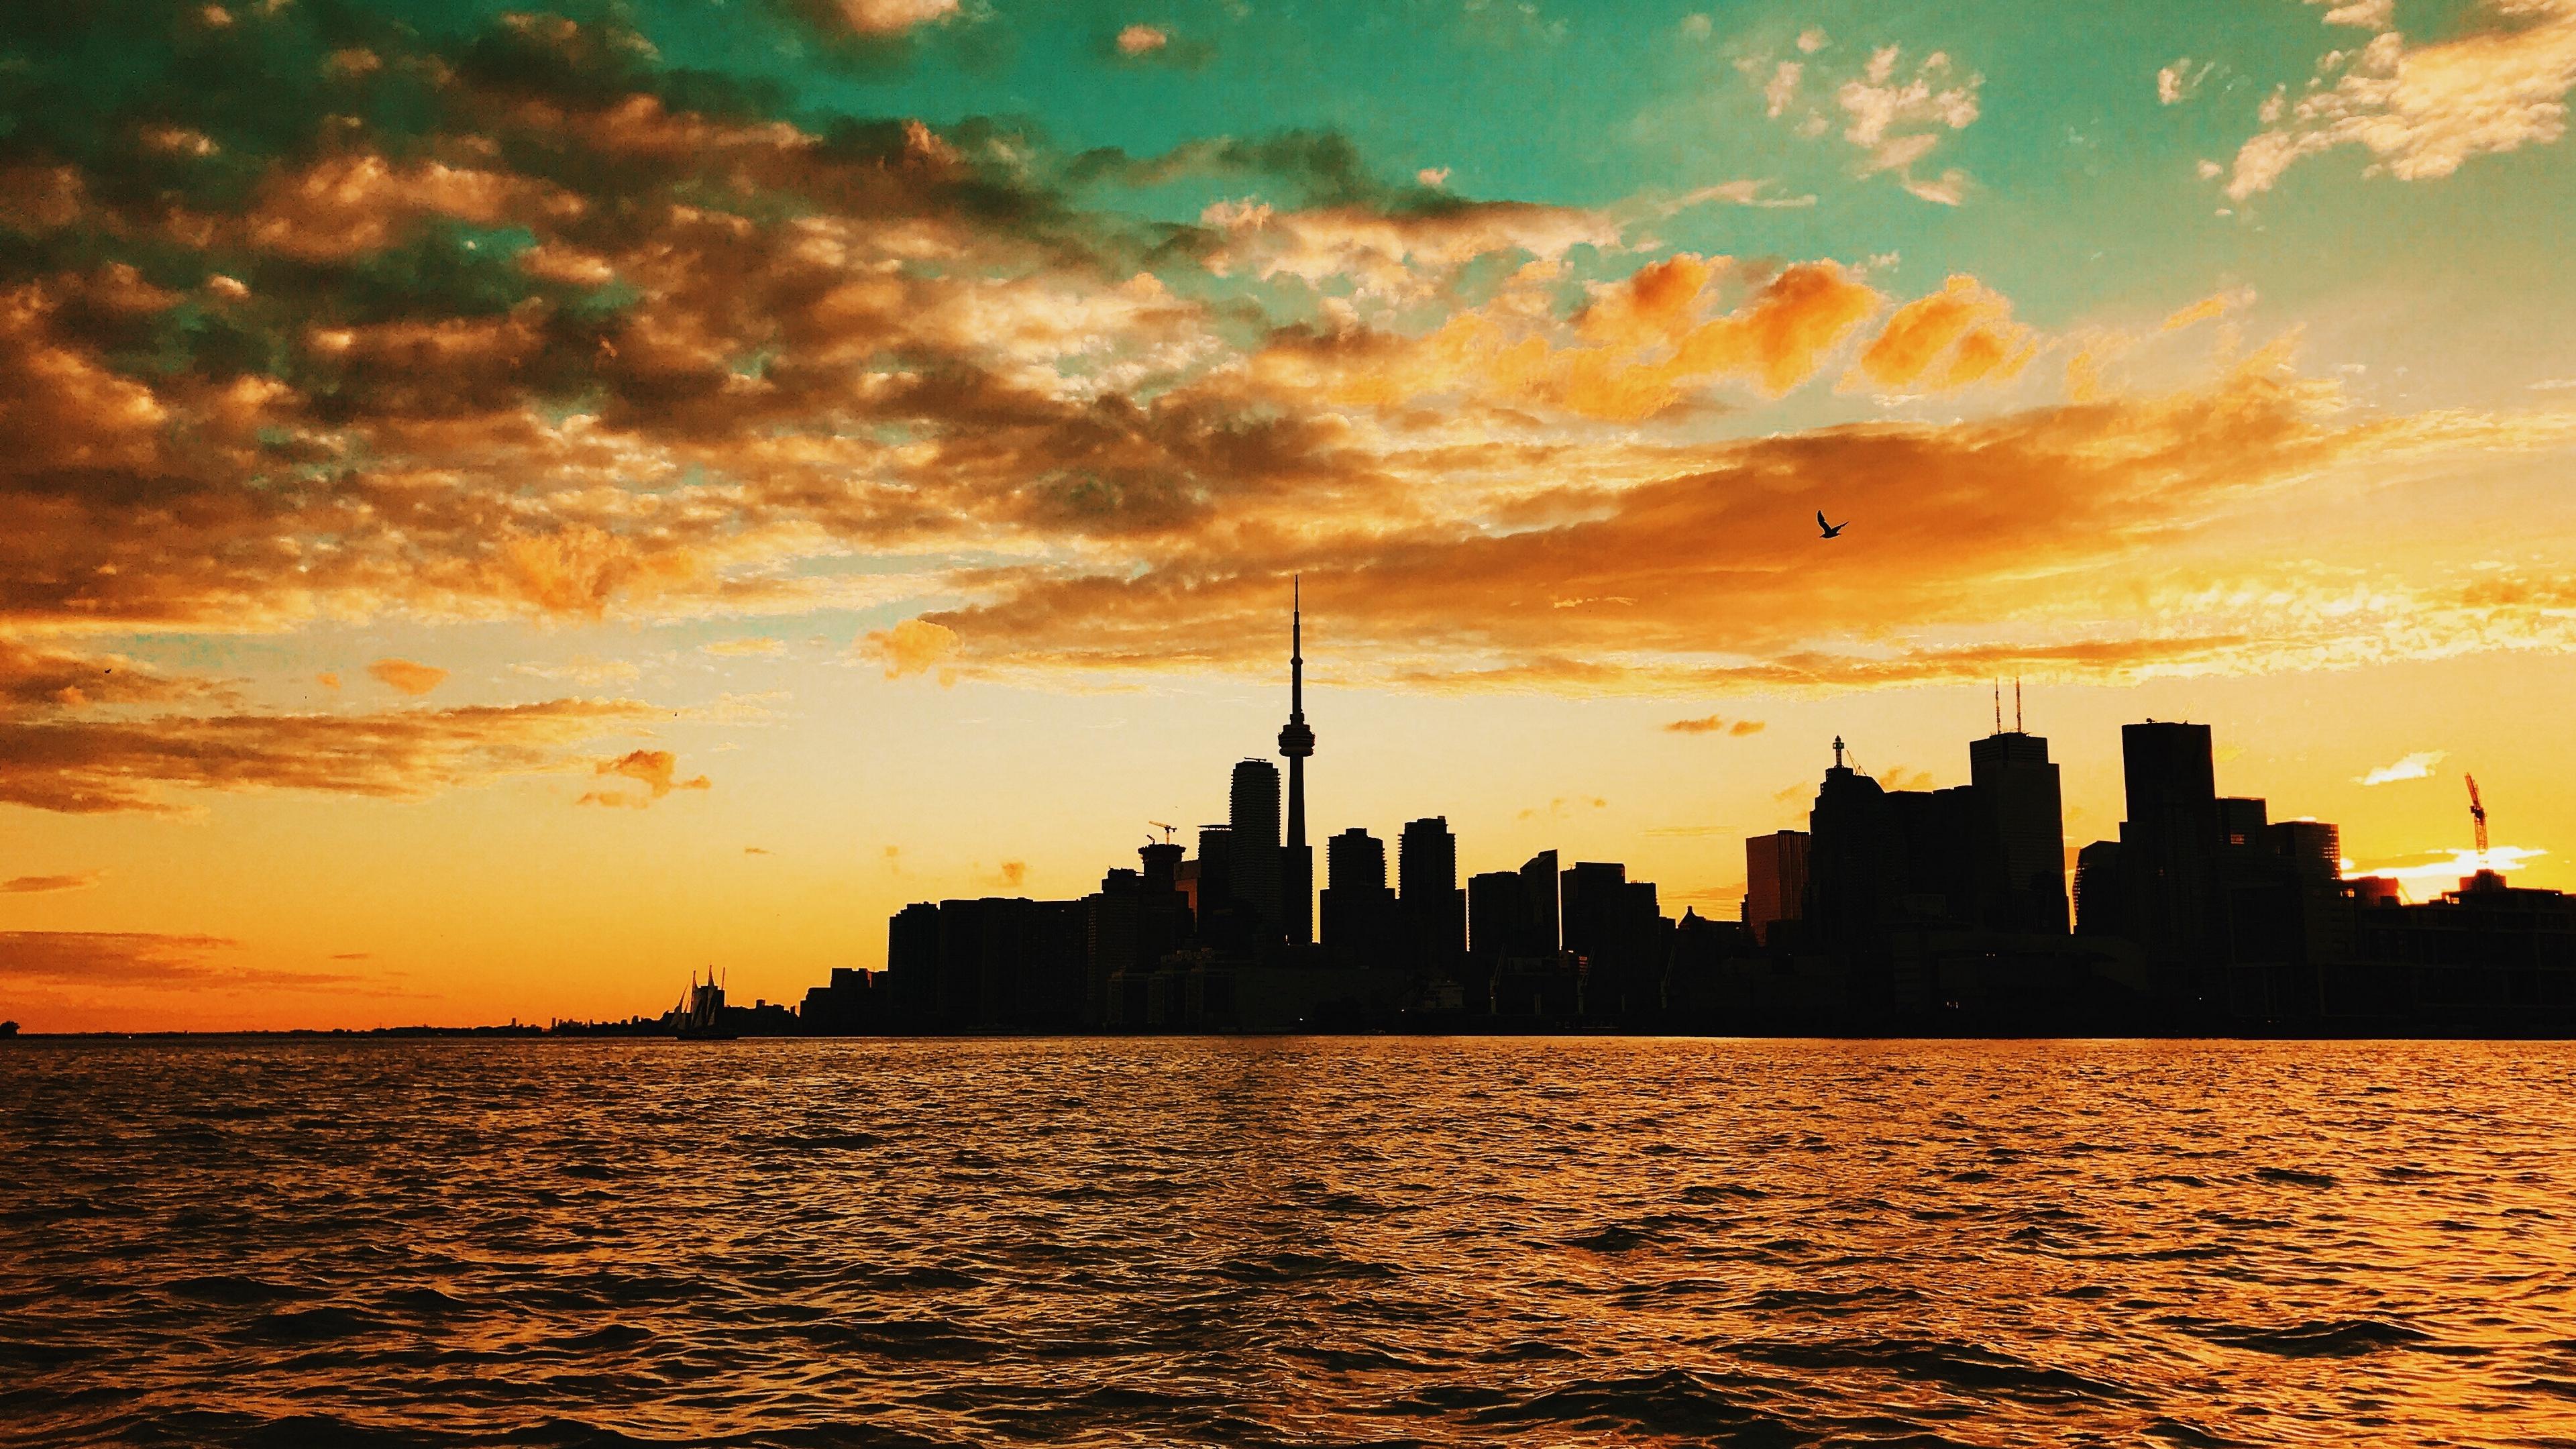 toronto canada sunset buildings sea 4k 1538066843 - toronto, canada, sunset, buildings, sea 4k - Toronto, sunset, Canada